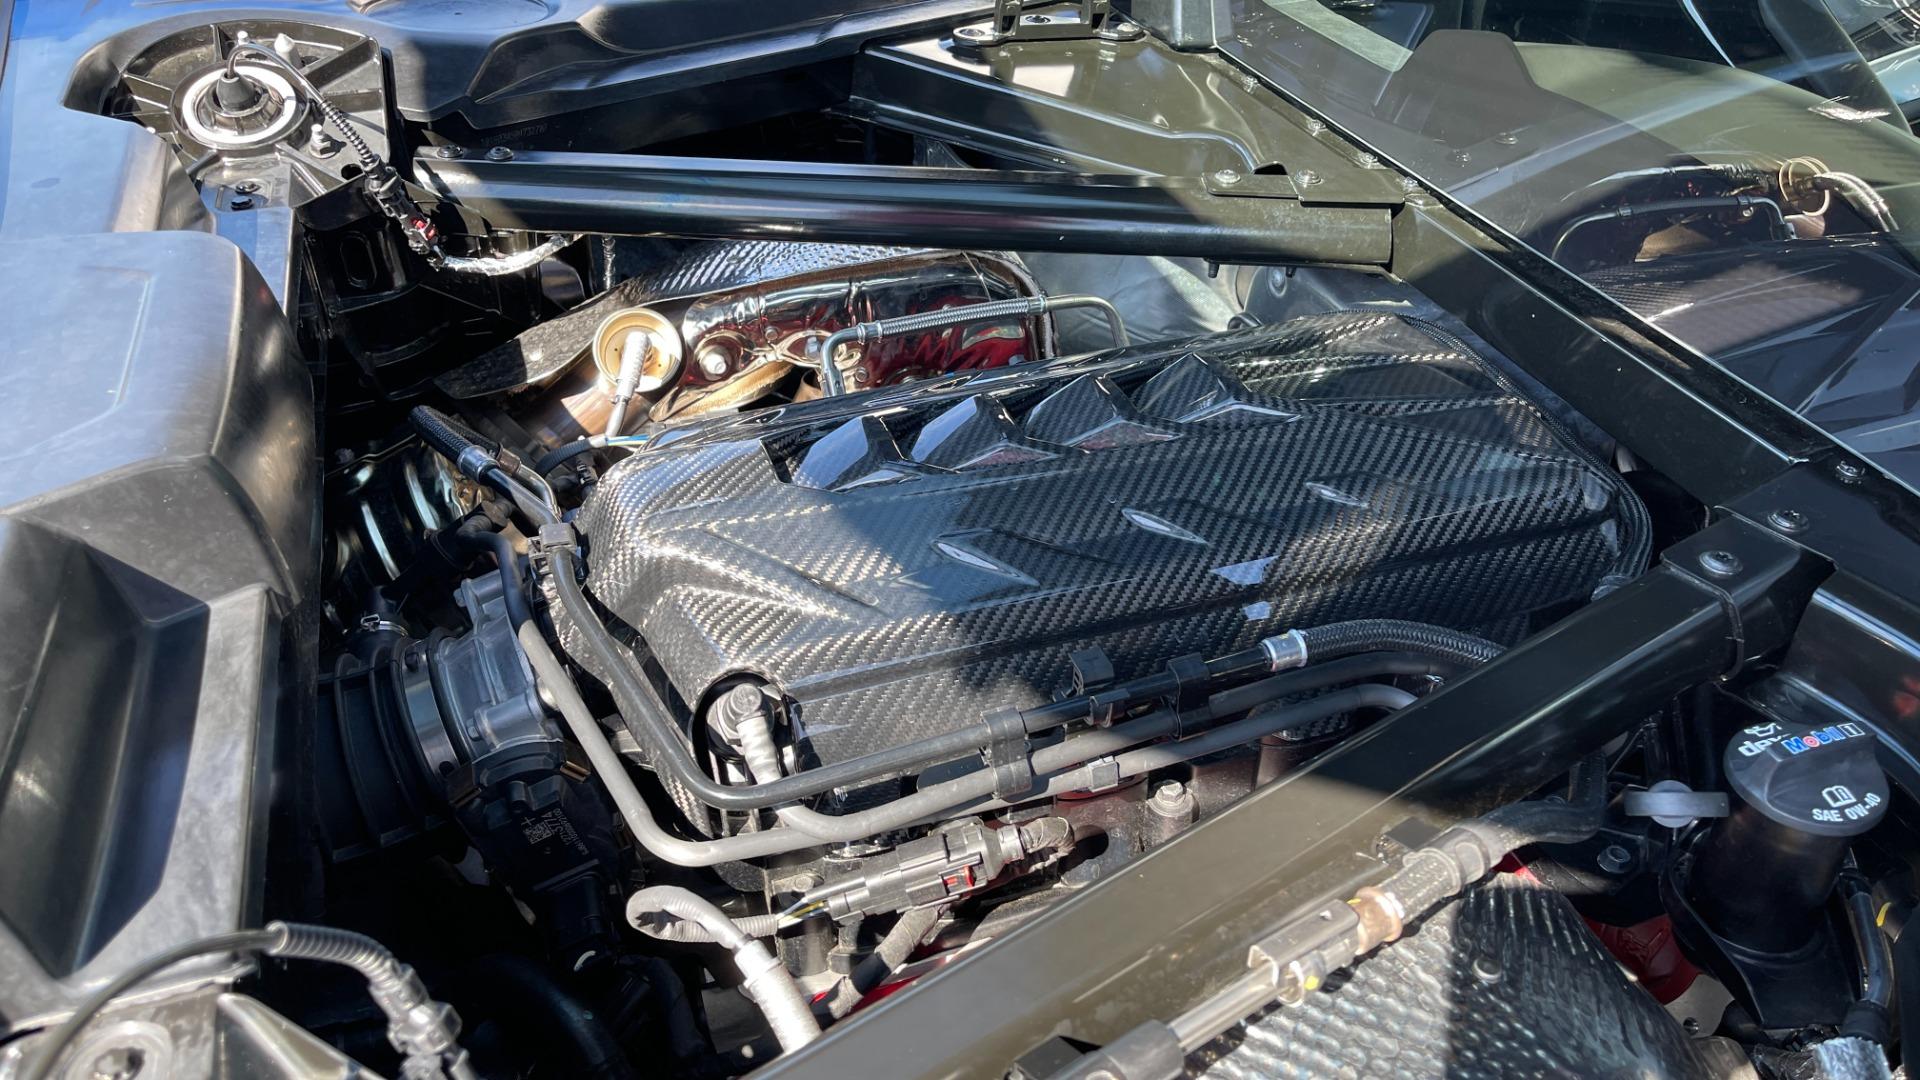 Used 2021 Chevrolet CORVETTE STINGRAY 3LT COUPE / 8-SPD / PERF PKG / NAV / BOSE / REARVIEW for sale $110,995 at Formula Imports in Charlotte NC 28227 23